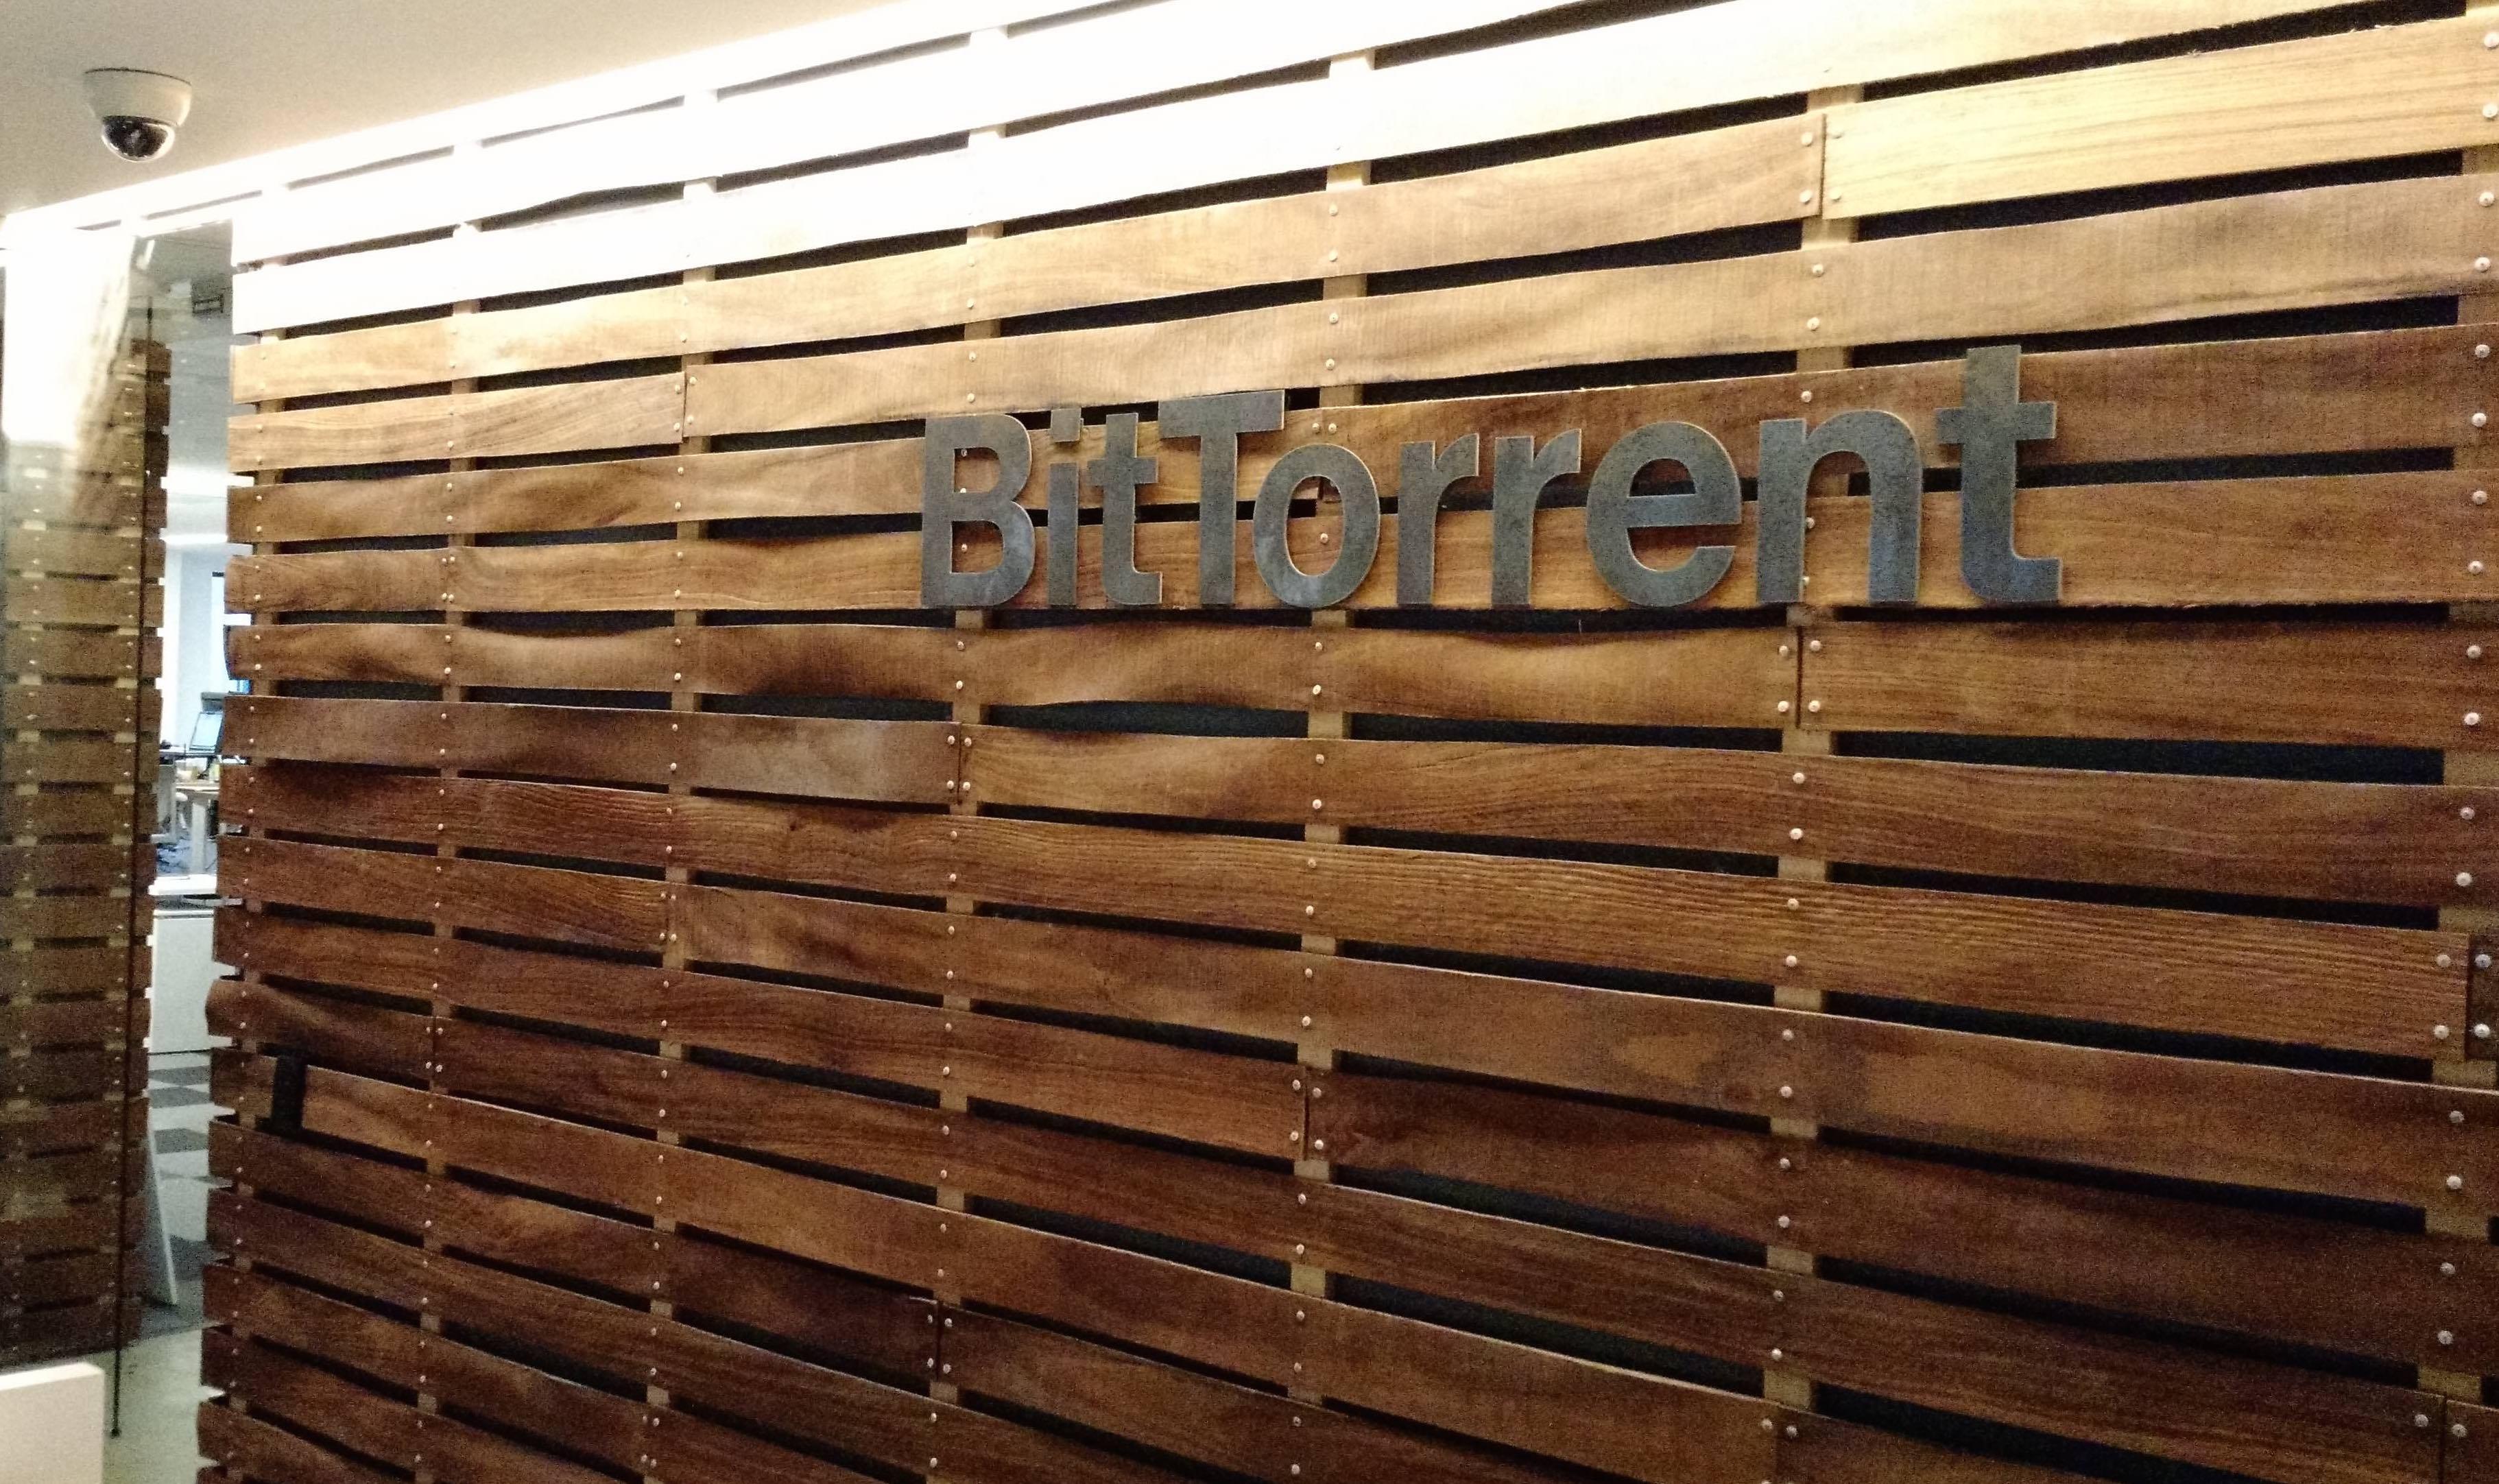 At BitTorrent headquarters in San Francisco.